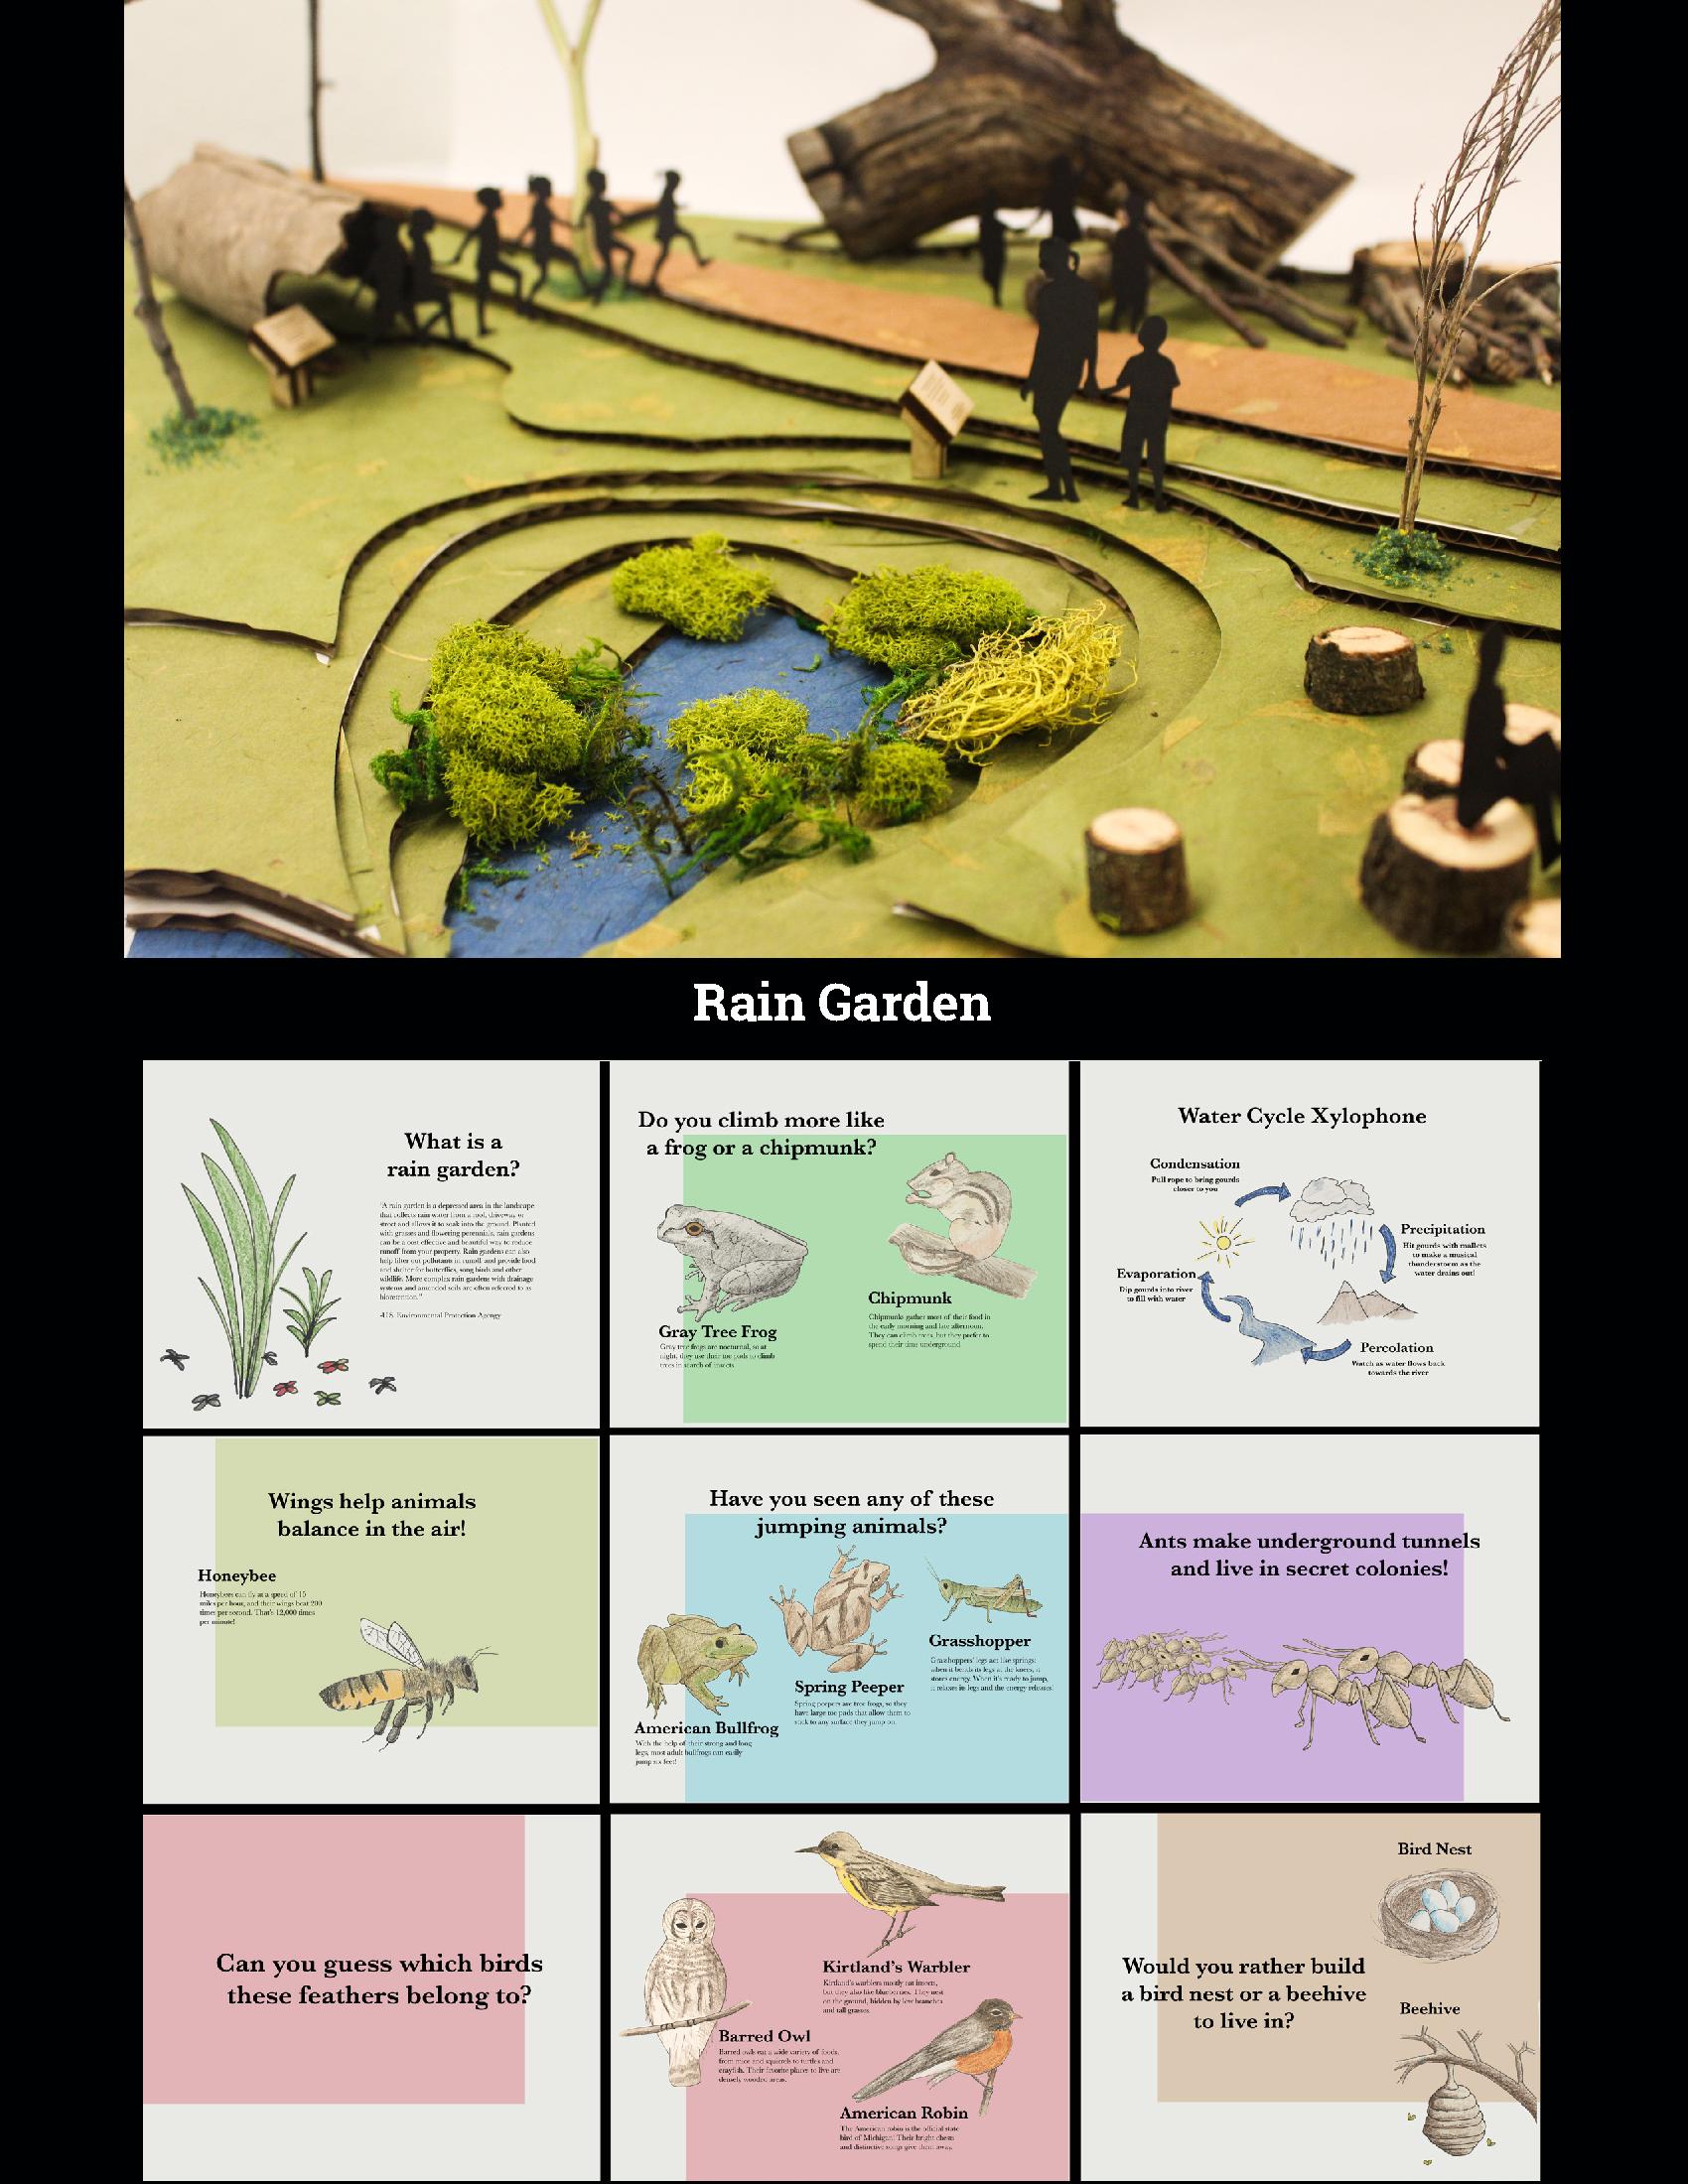 Rain Garden and Signs